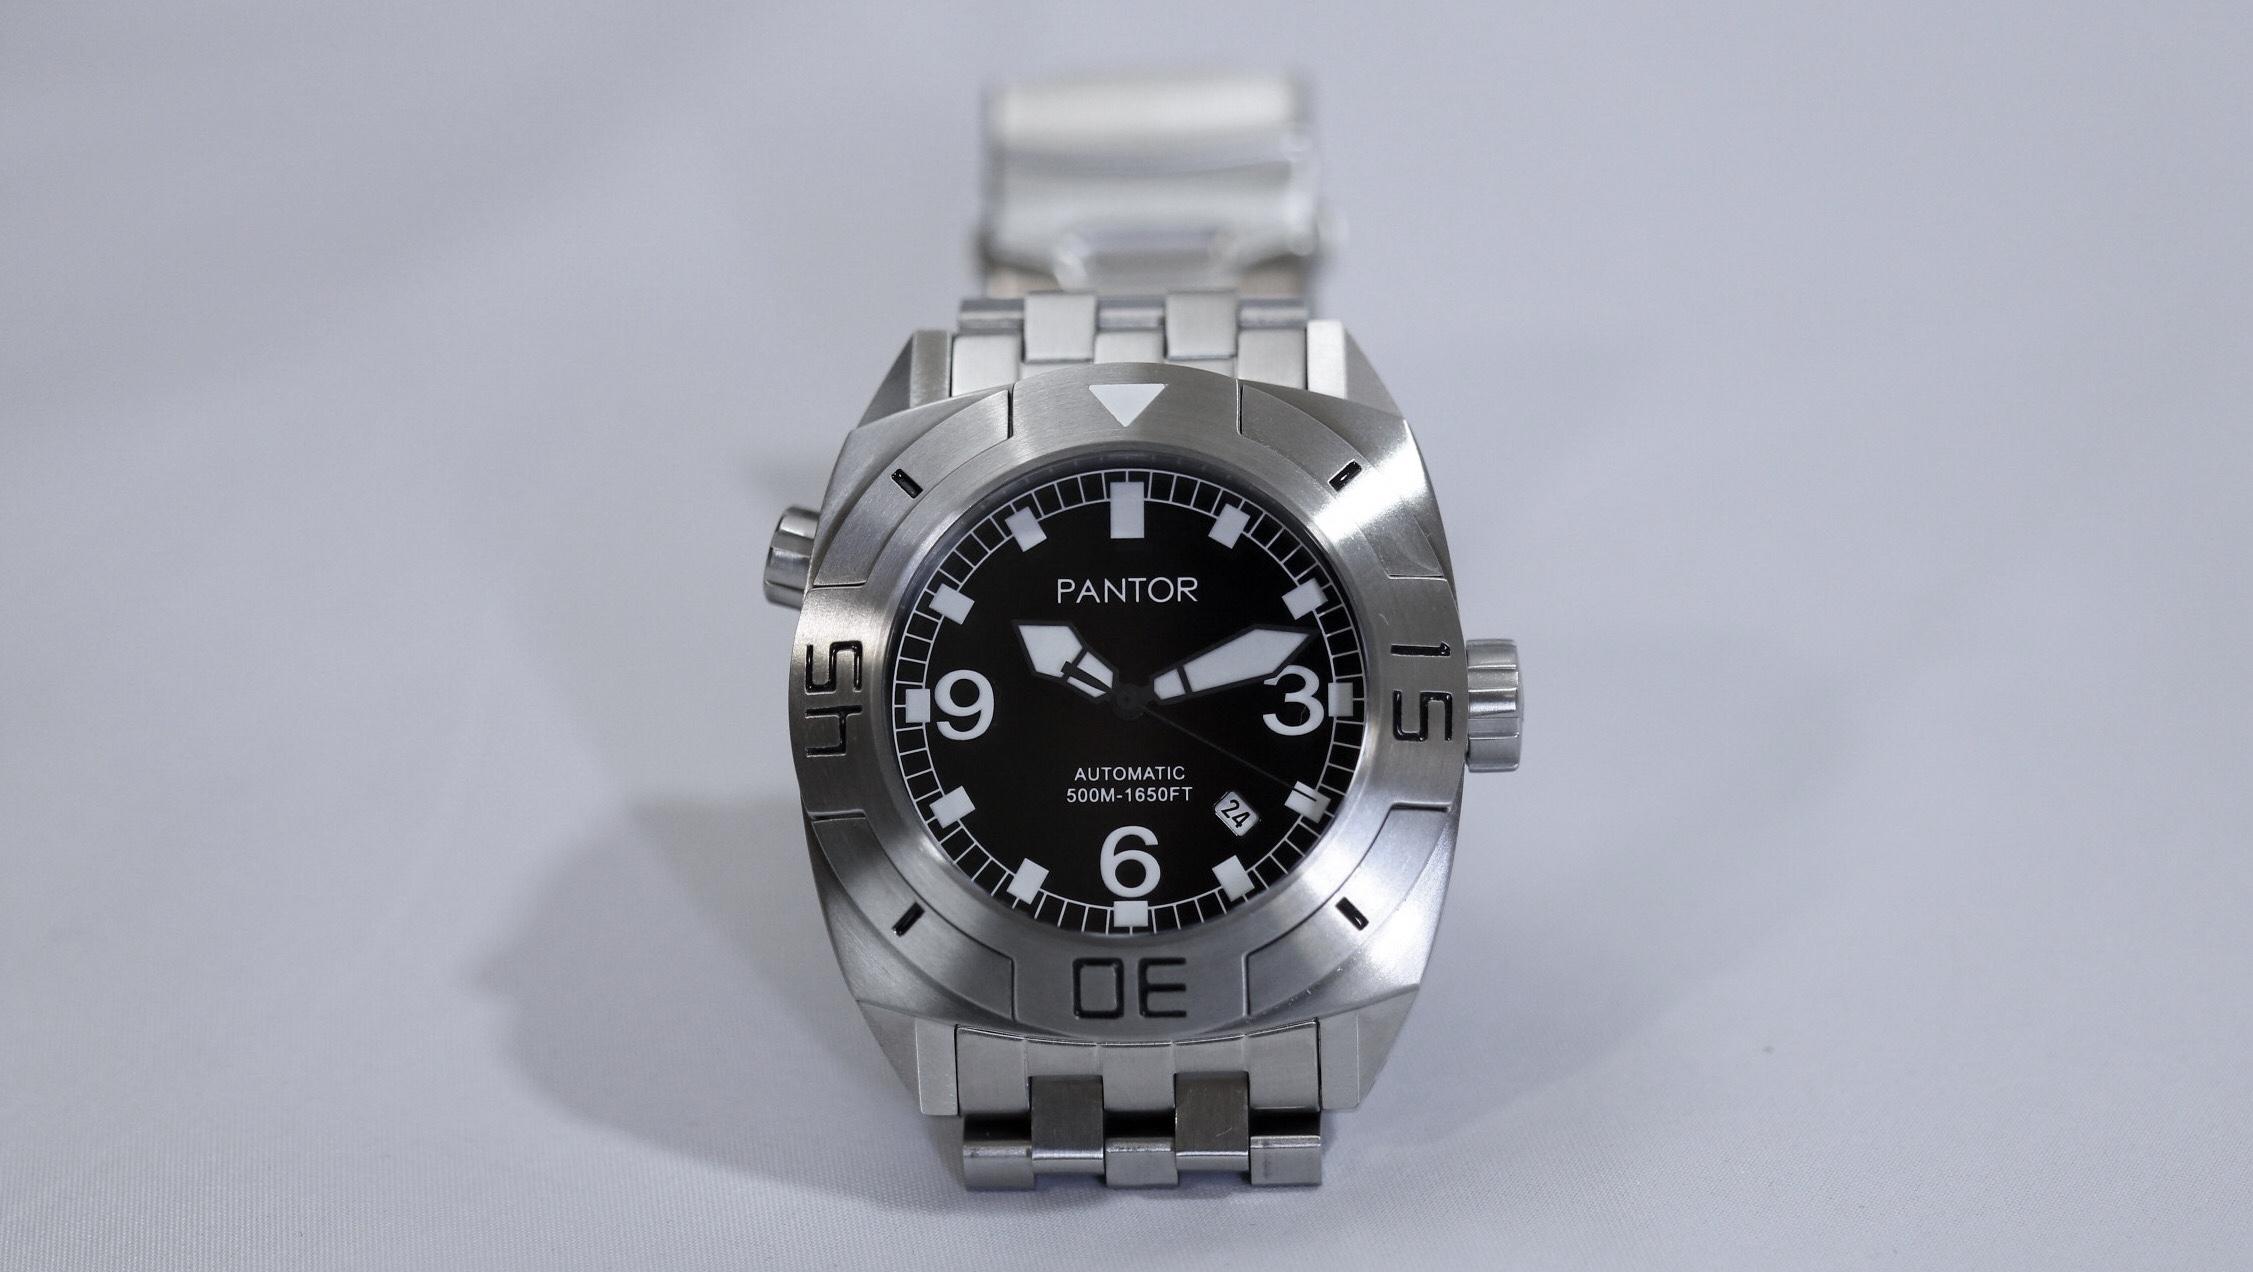 Pantor Seal